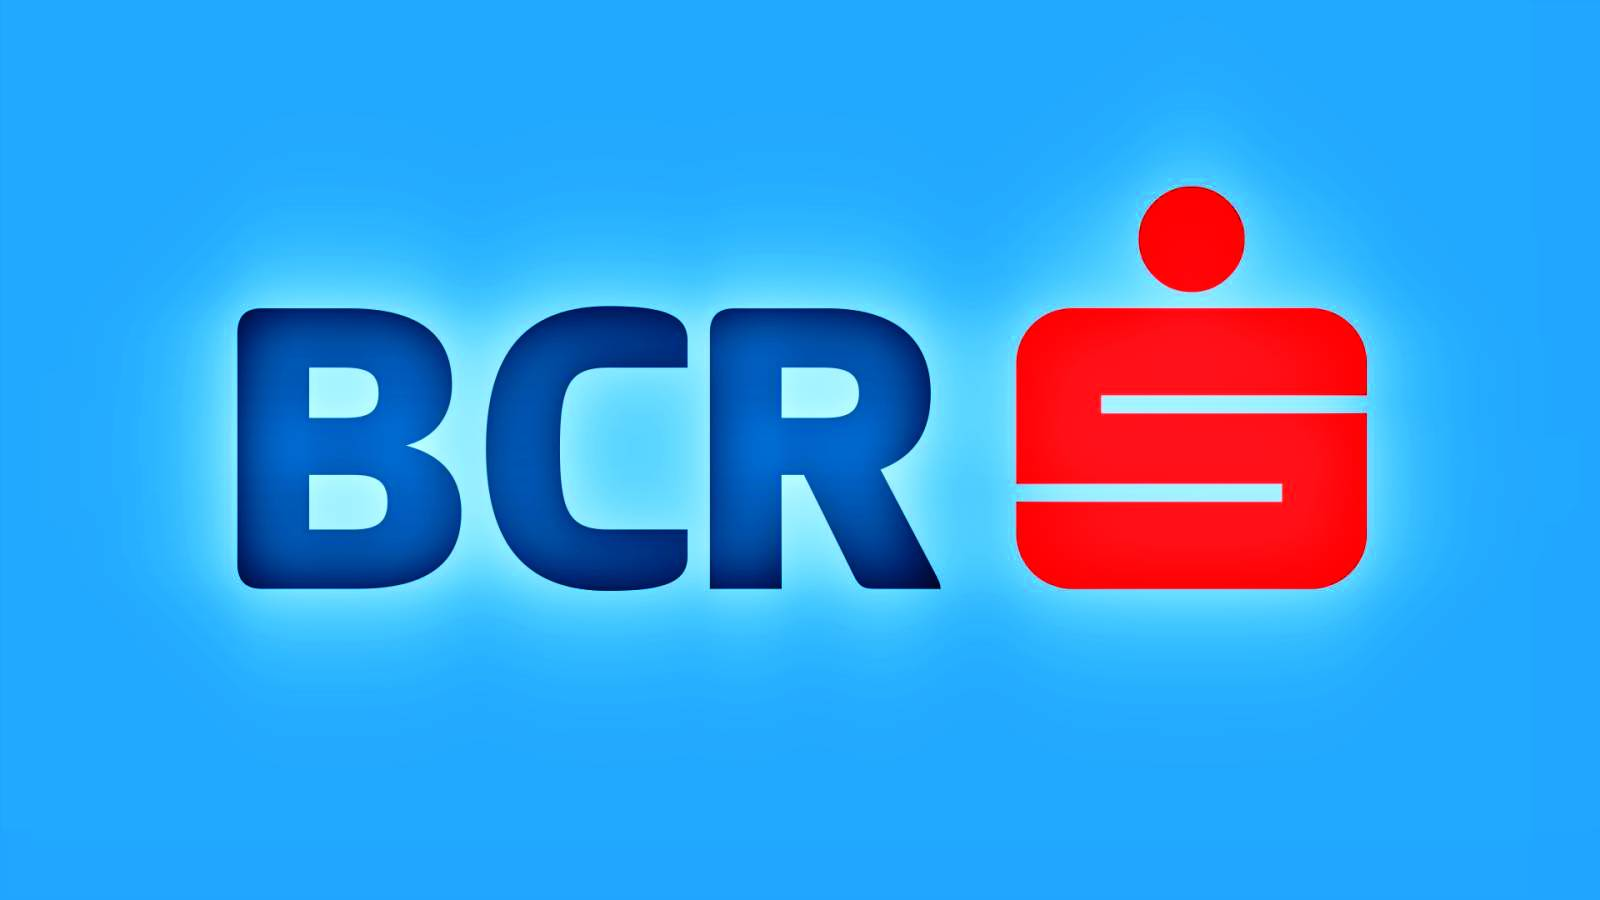 BCR Romania valoare